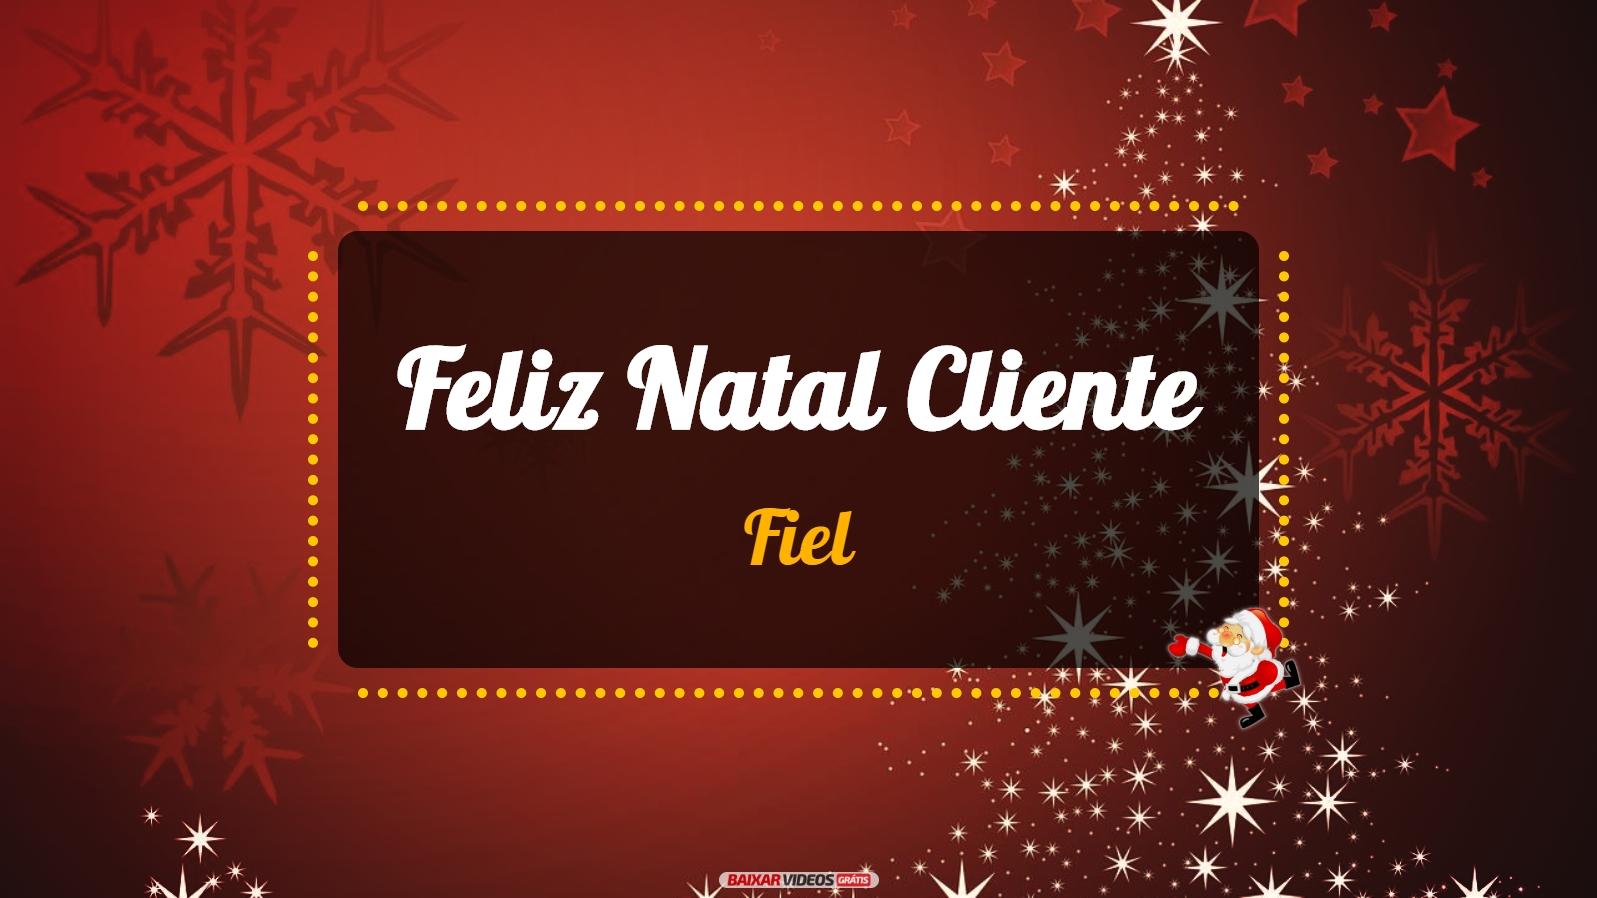 Feliz Natal Mensagem De Natal Para Cliente Fiel